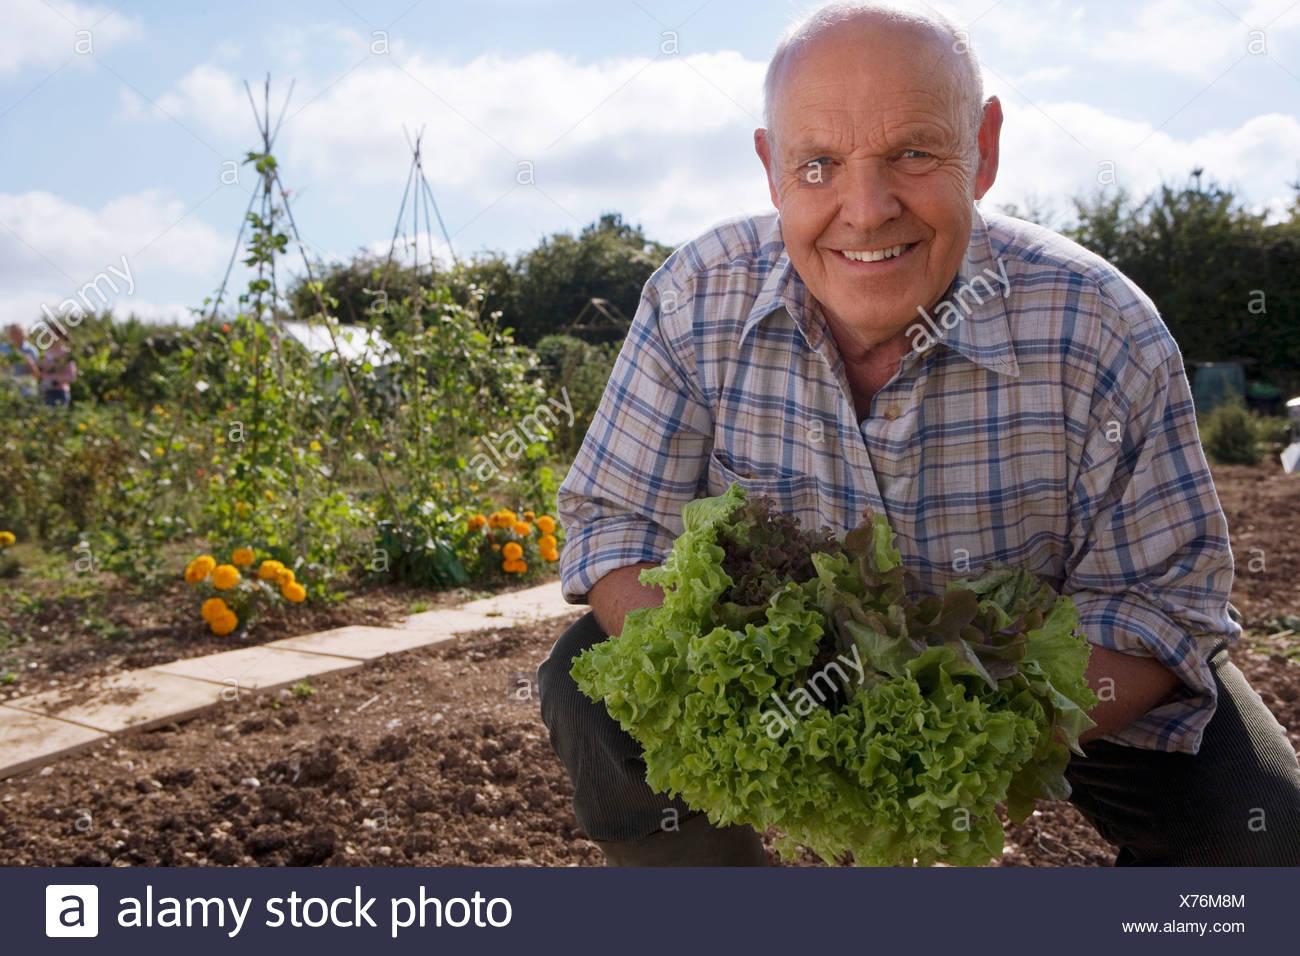 Senior man in checked shirt holding fresh leaf vegetable in garden crouching smiling portrait - Stock Image